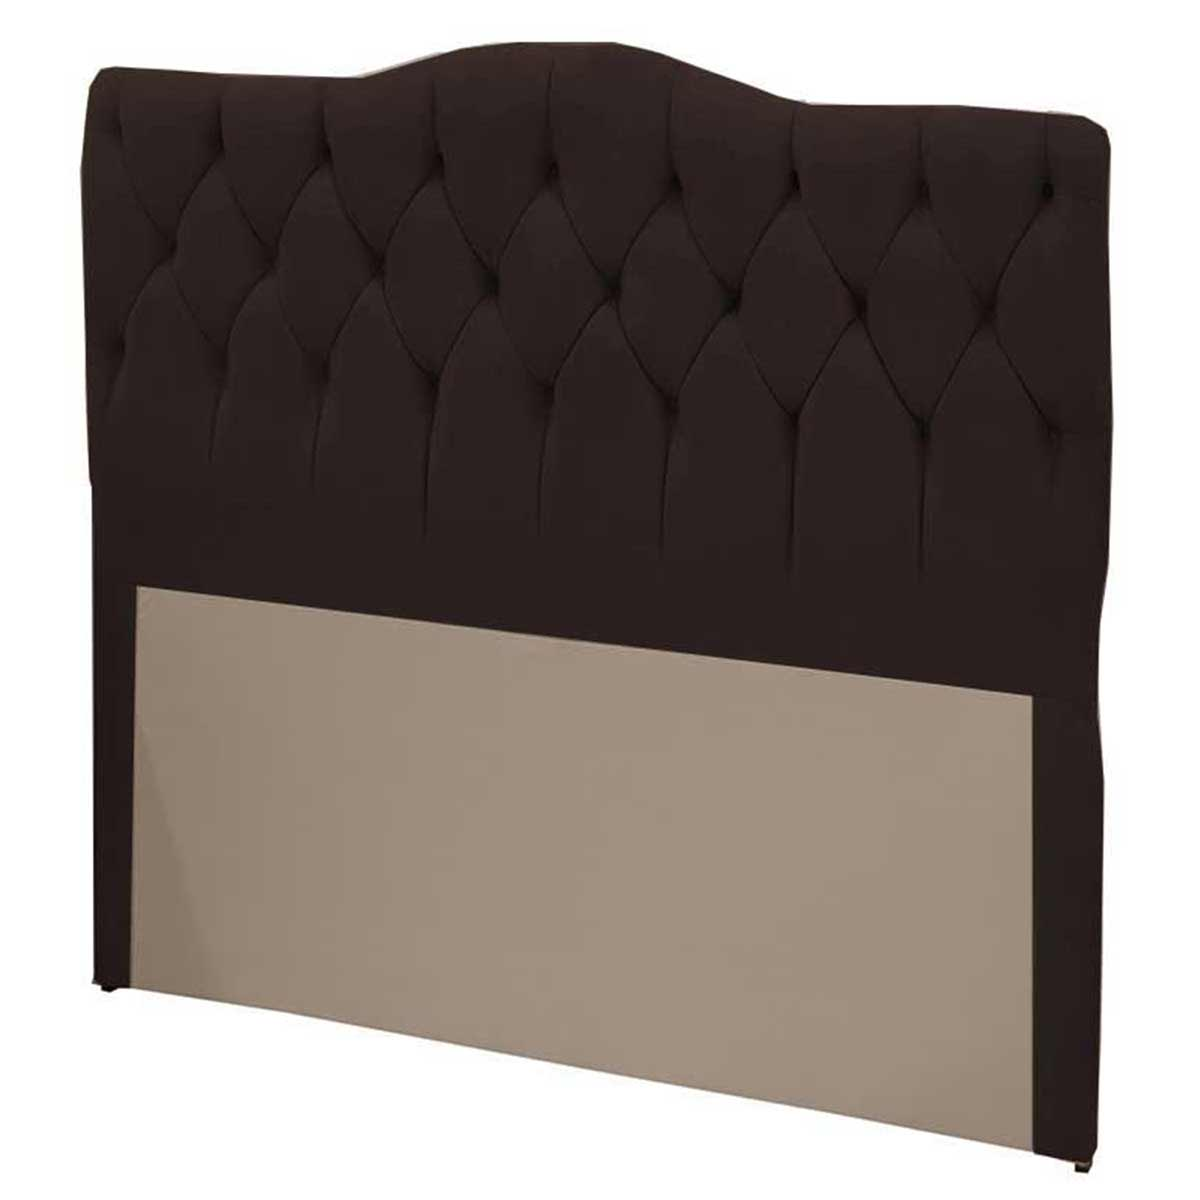 Cabeceira King Estofada Luxury 195 cm Suede Negro Simbal